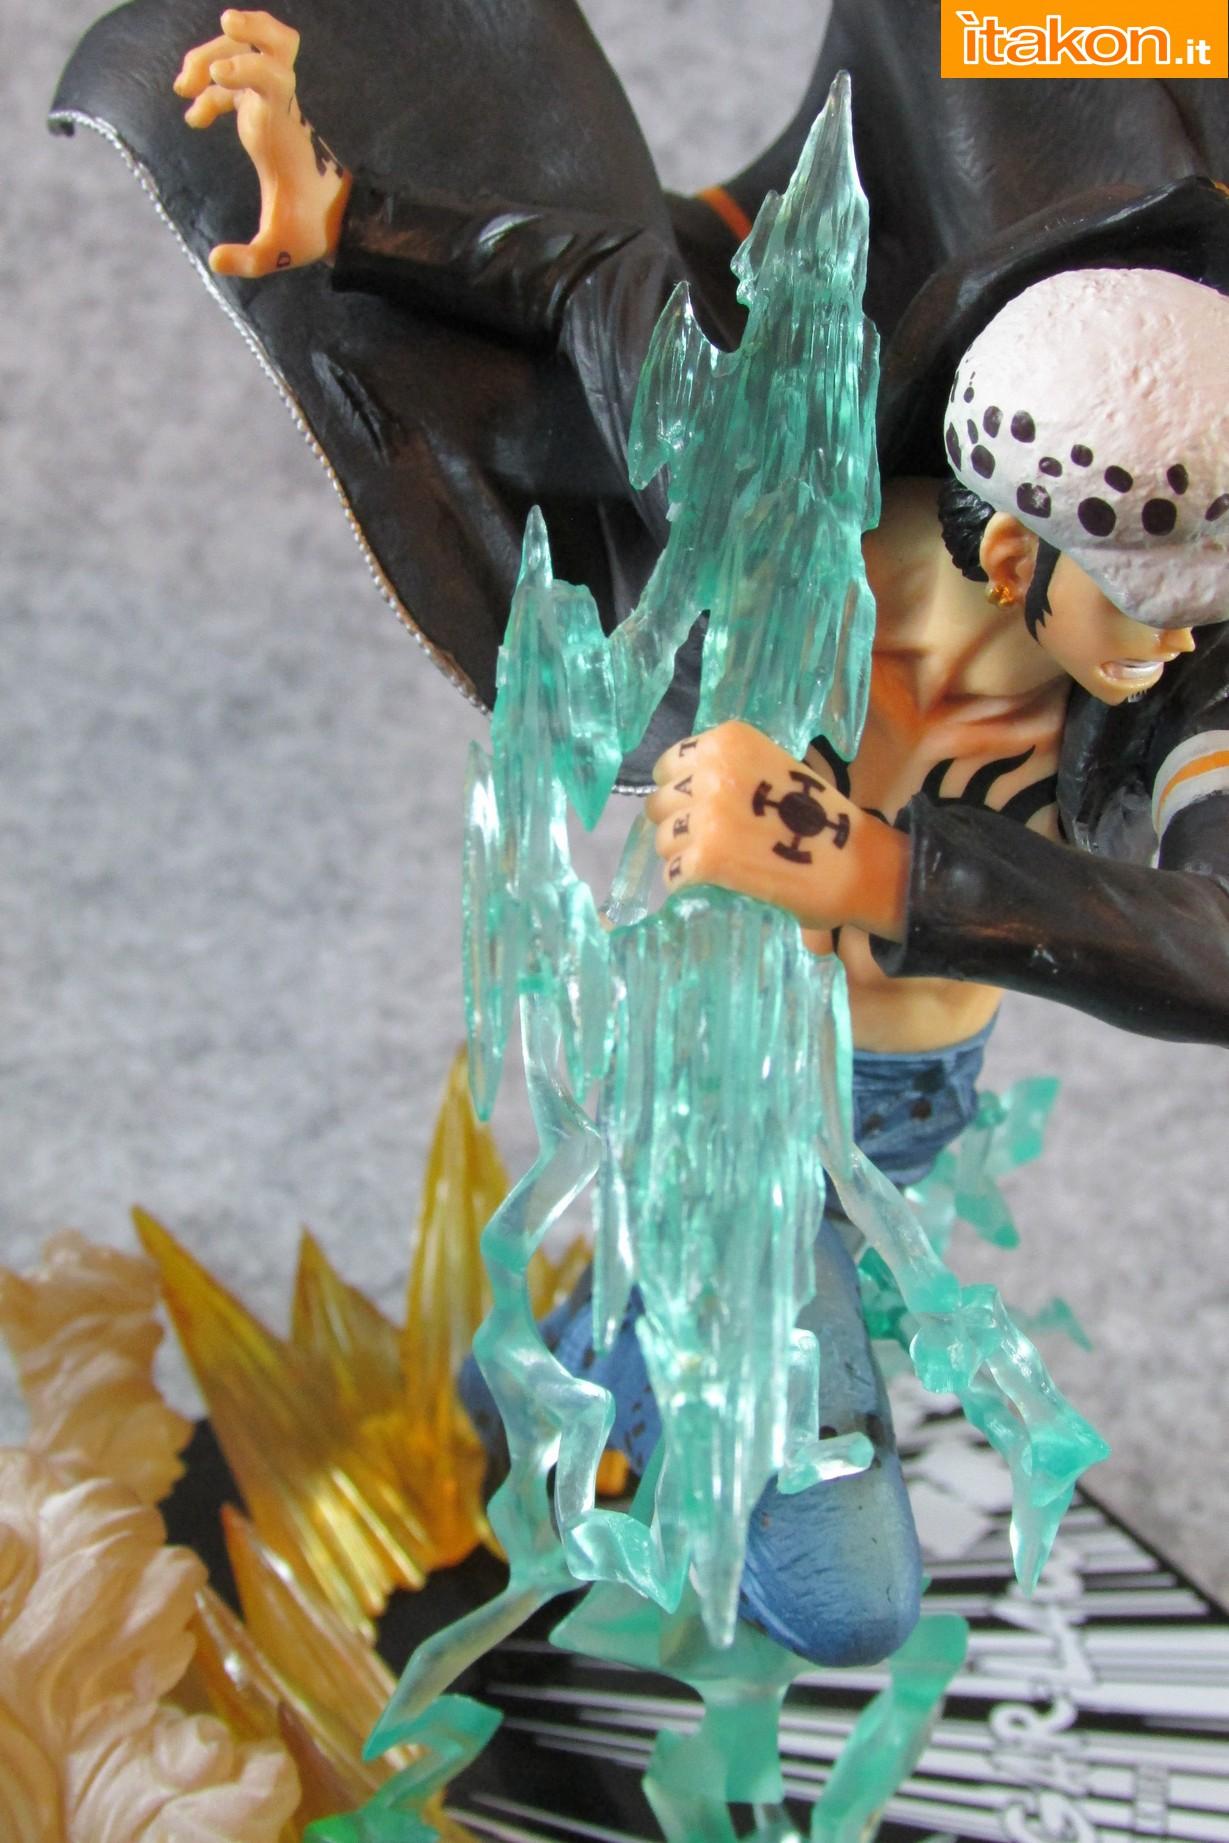 Link a One Piece Trafalgar Law Gamma Knife Figuarts ZERO Chou Gekisen Extra Battle Recensione Review Itakon.it 42